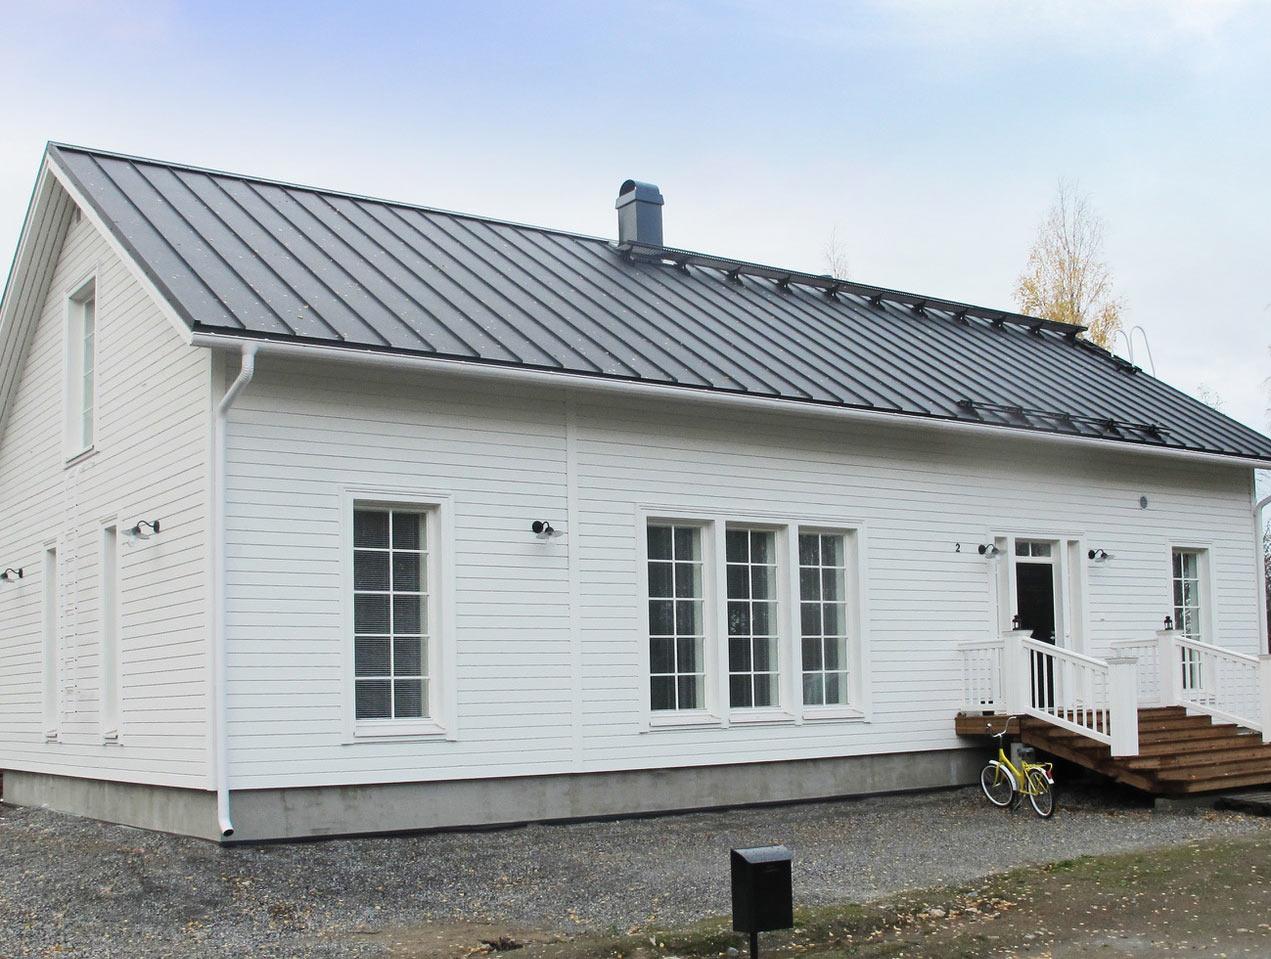 mv-lato-kuopio-002